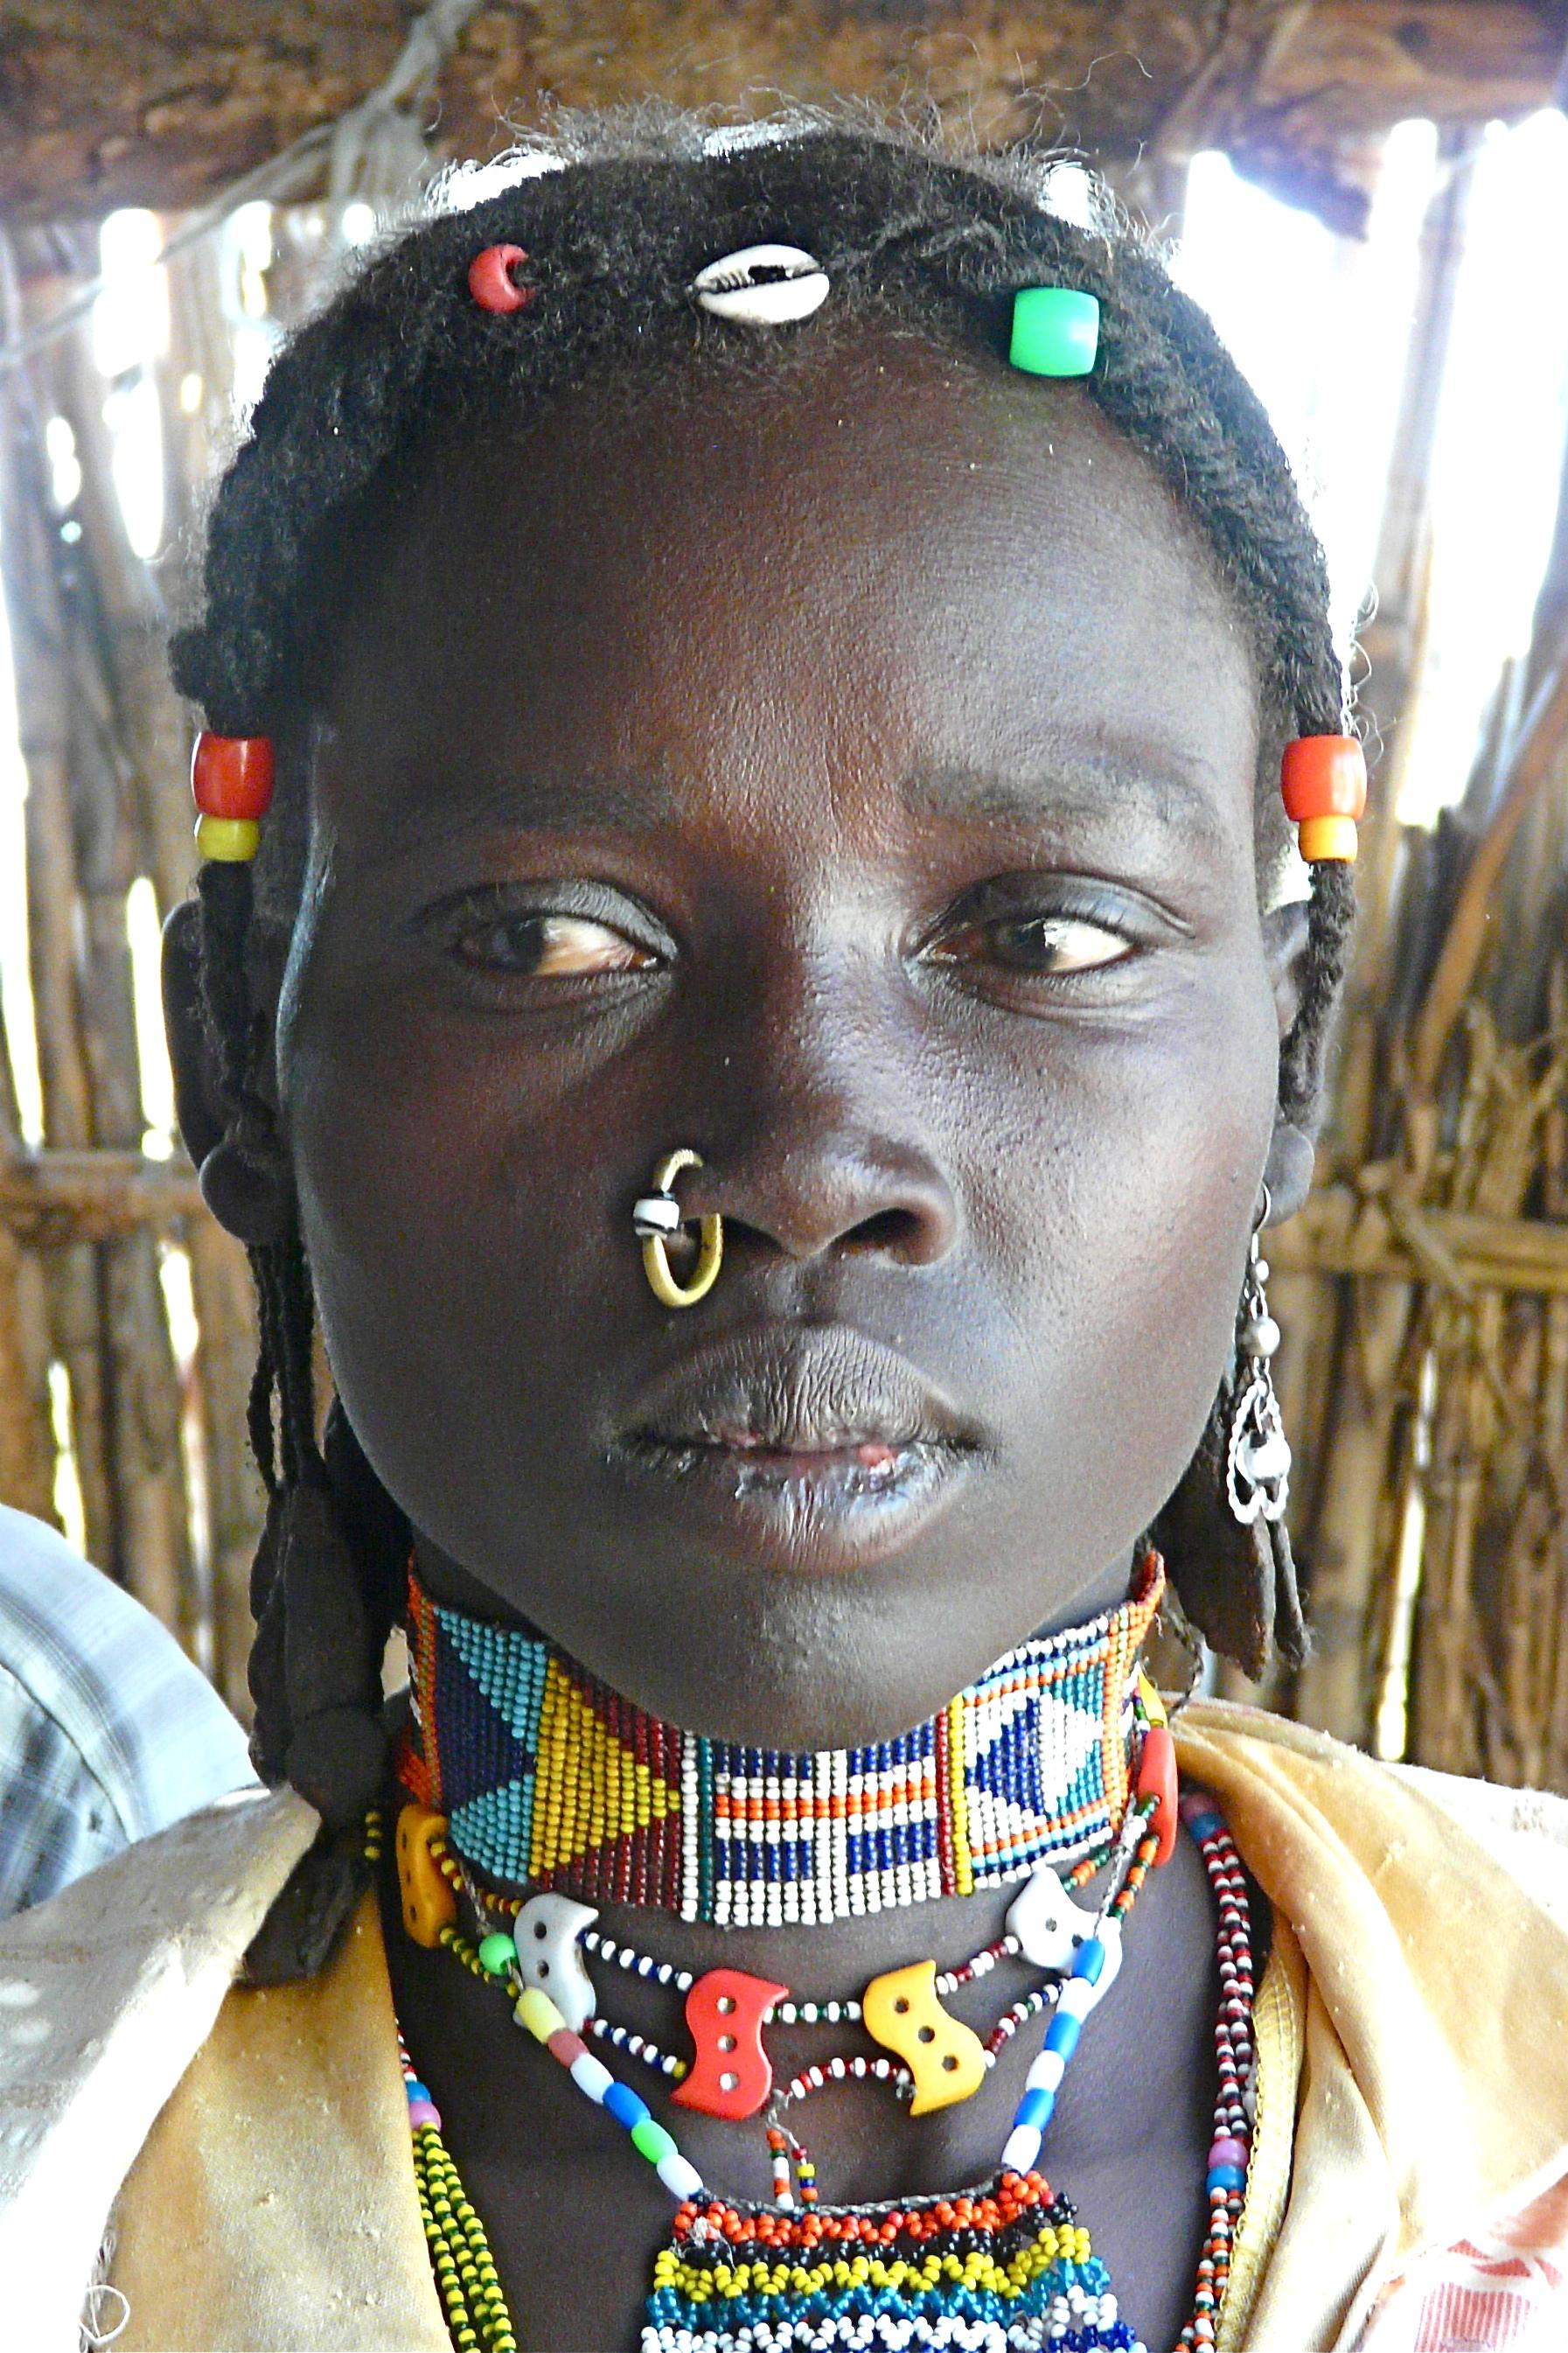 The Nuba Peoples Of North Sudan Warning Tribal Nudity